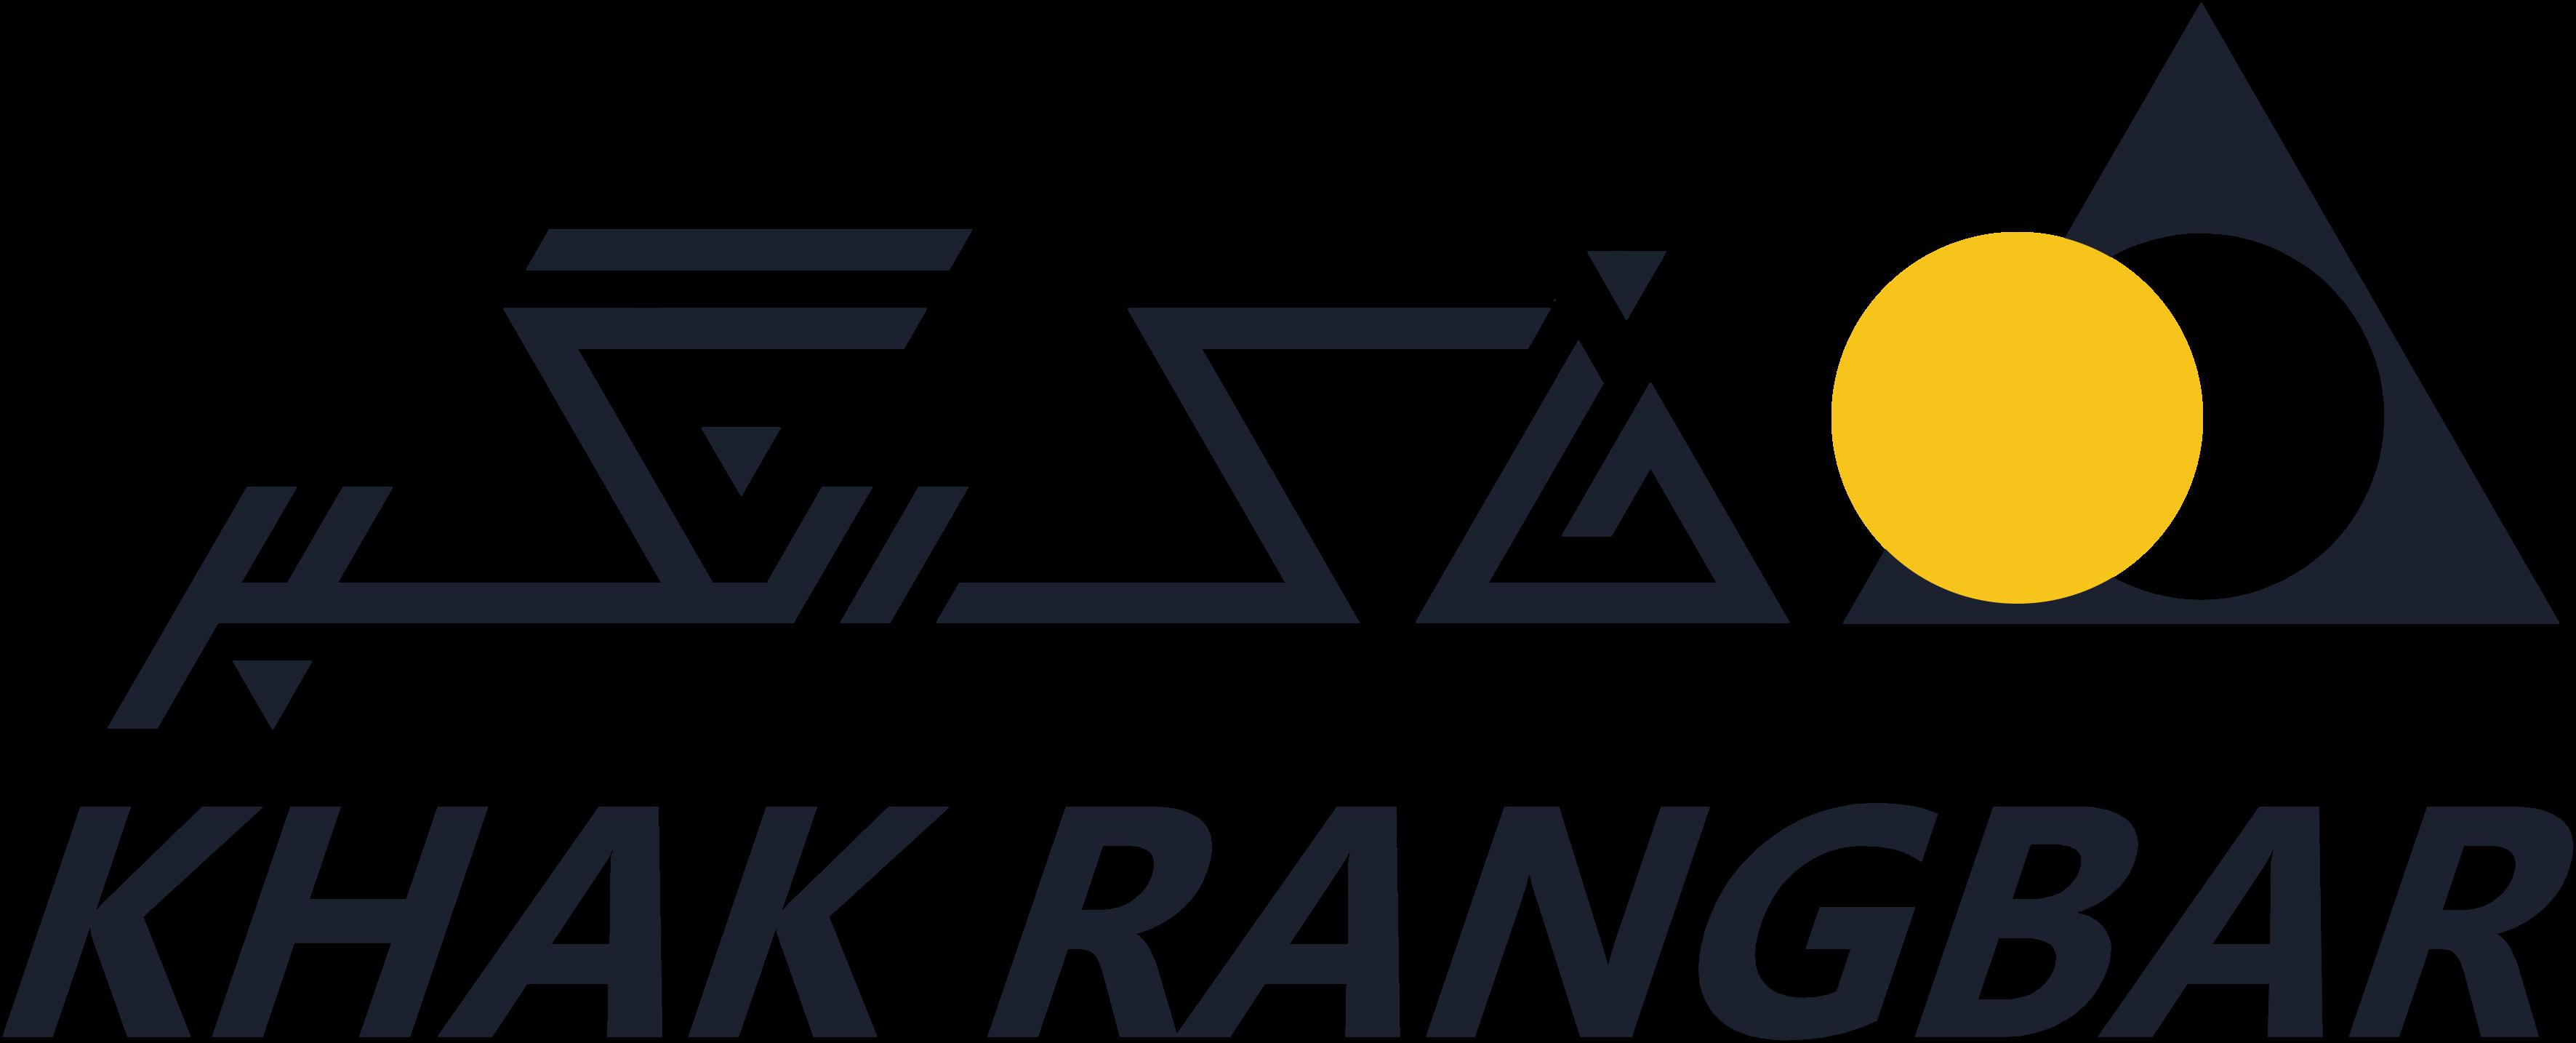 Khakrangbar